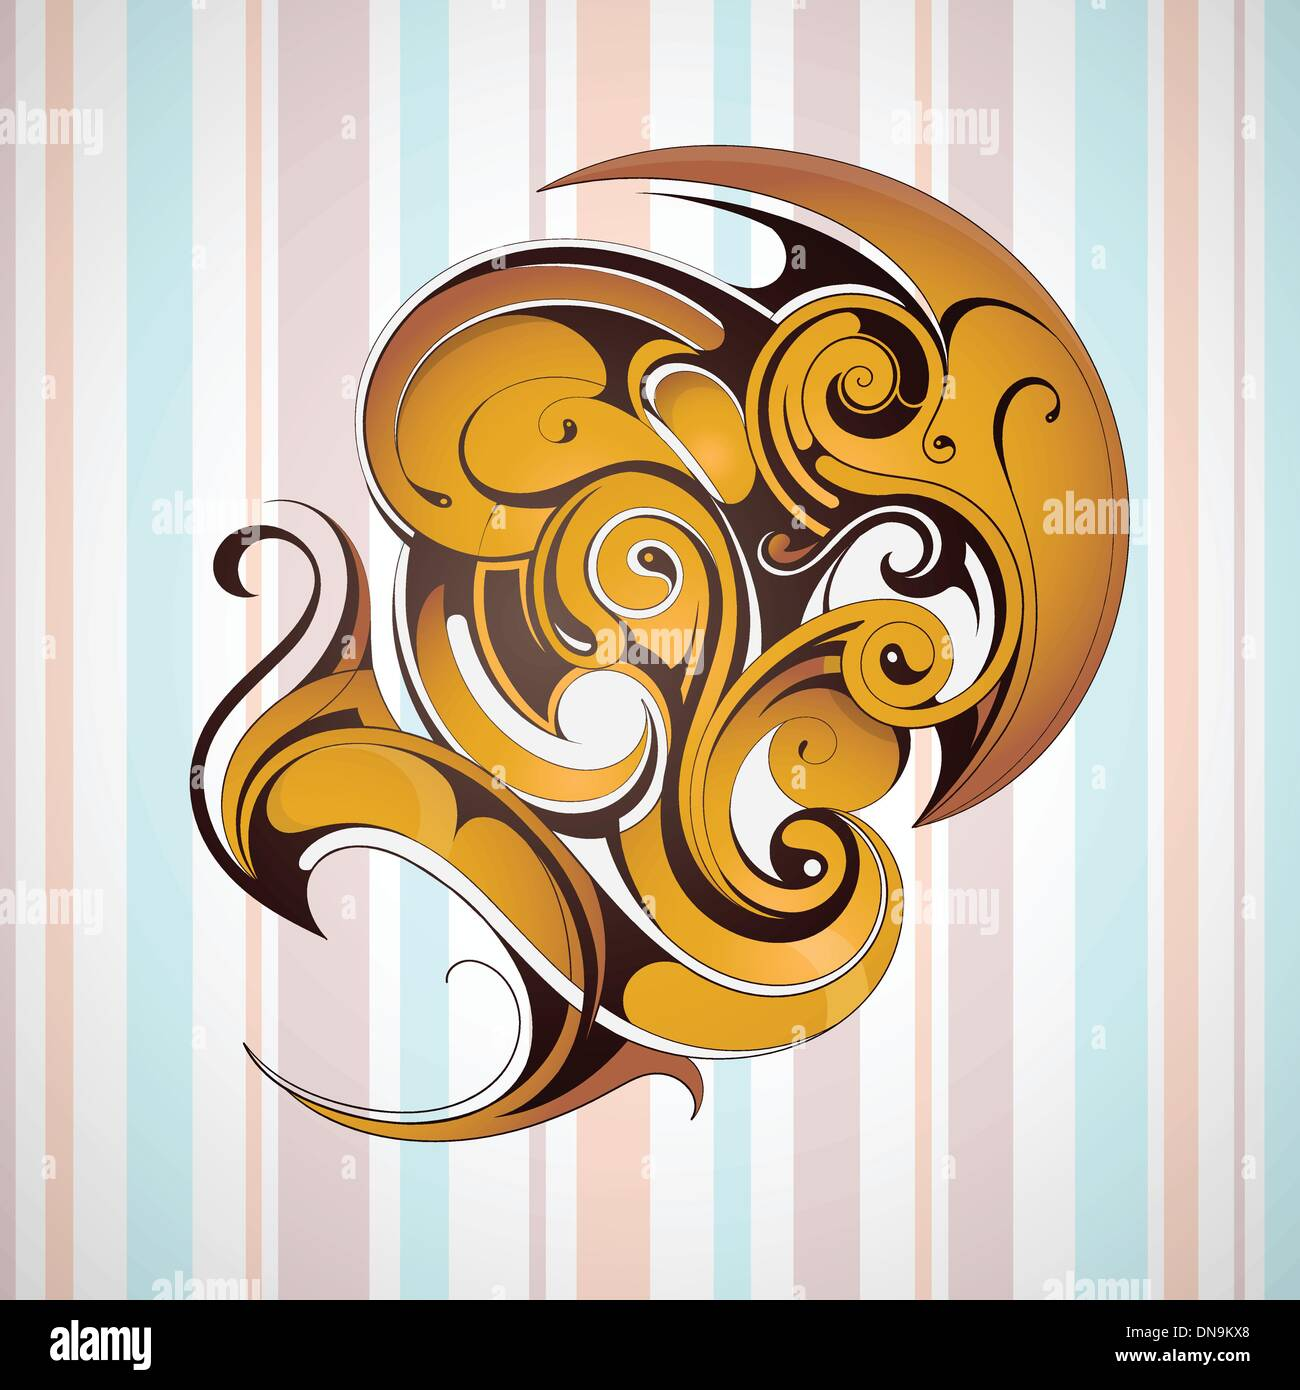 Graphic design element - Stock Image